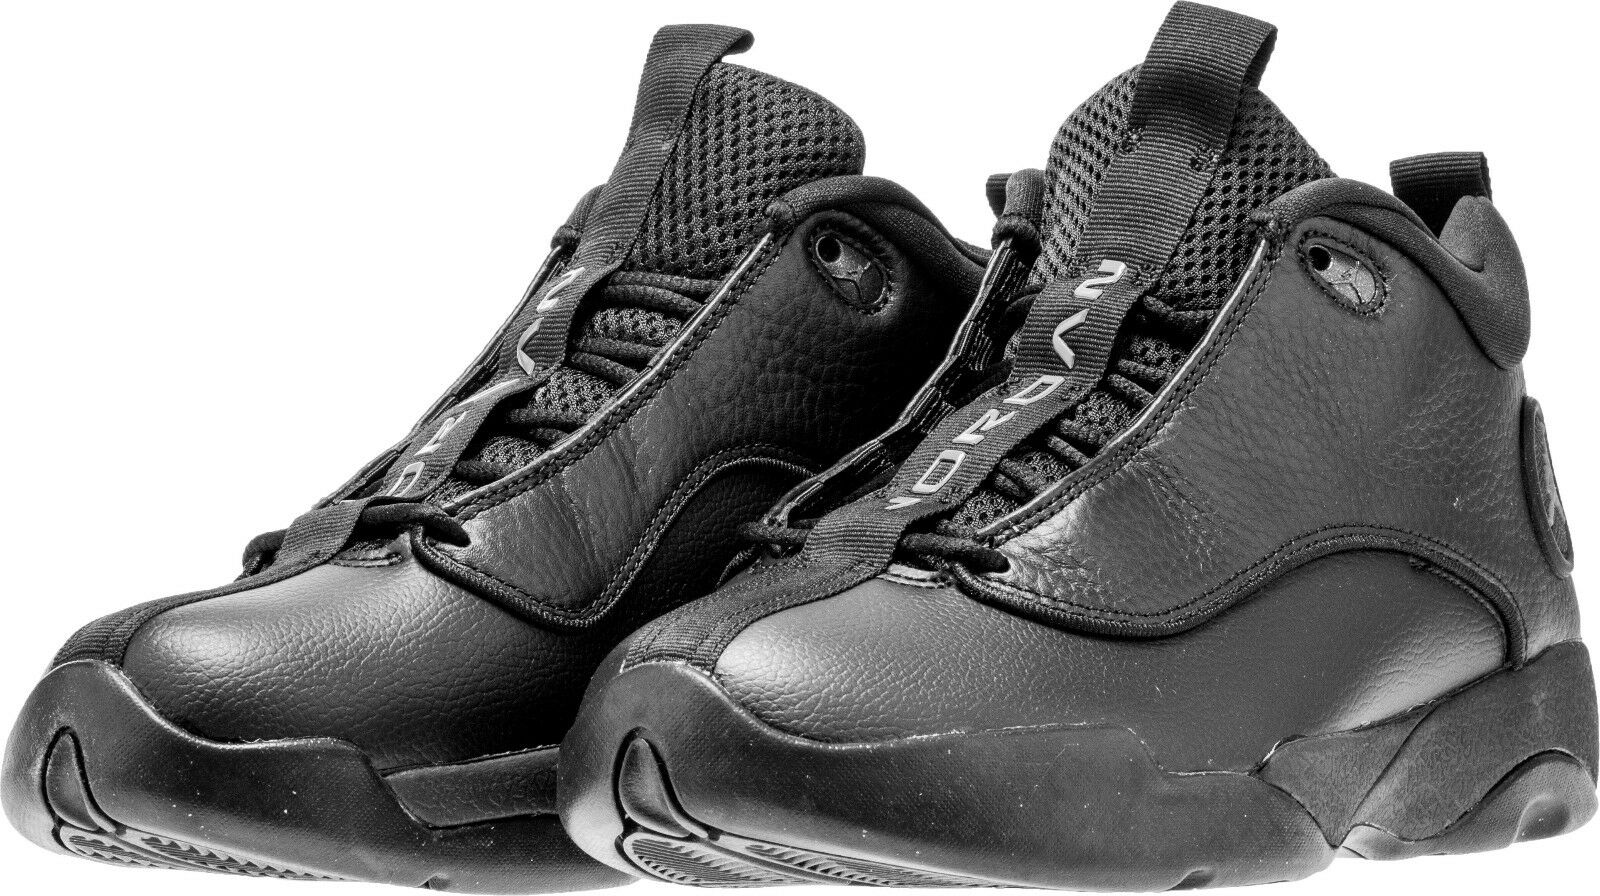 Para hombres Jordan Jumpman Pro Quick mediados Air Negro gris Tallas 8-12 Nuevo en Caja 932687-011